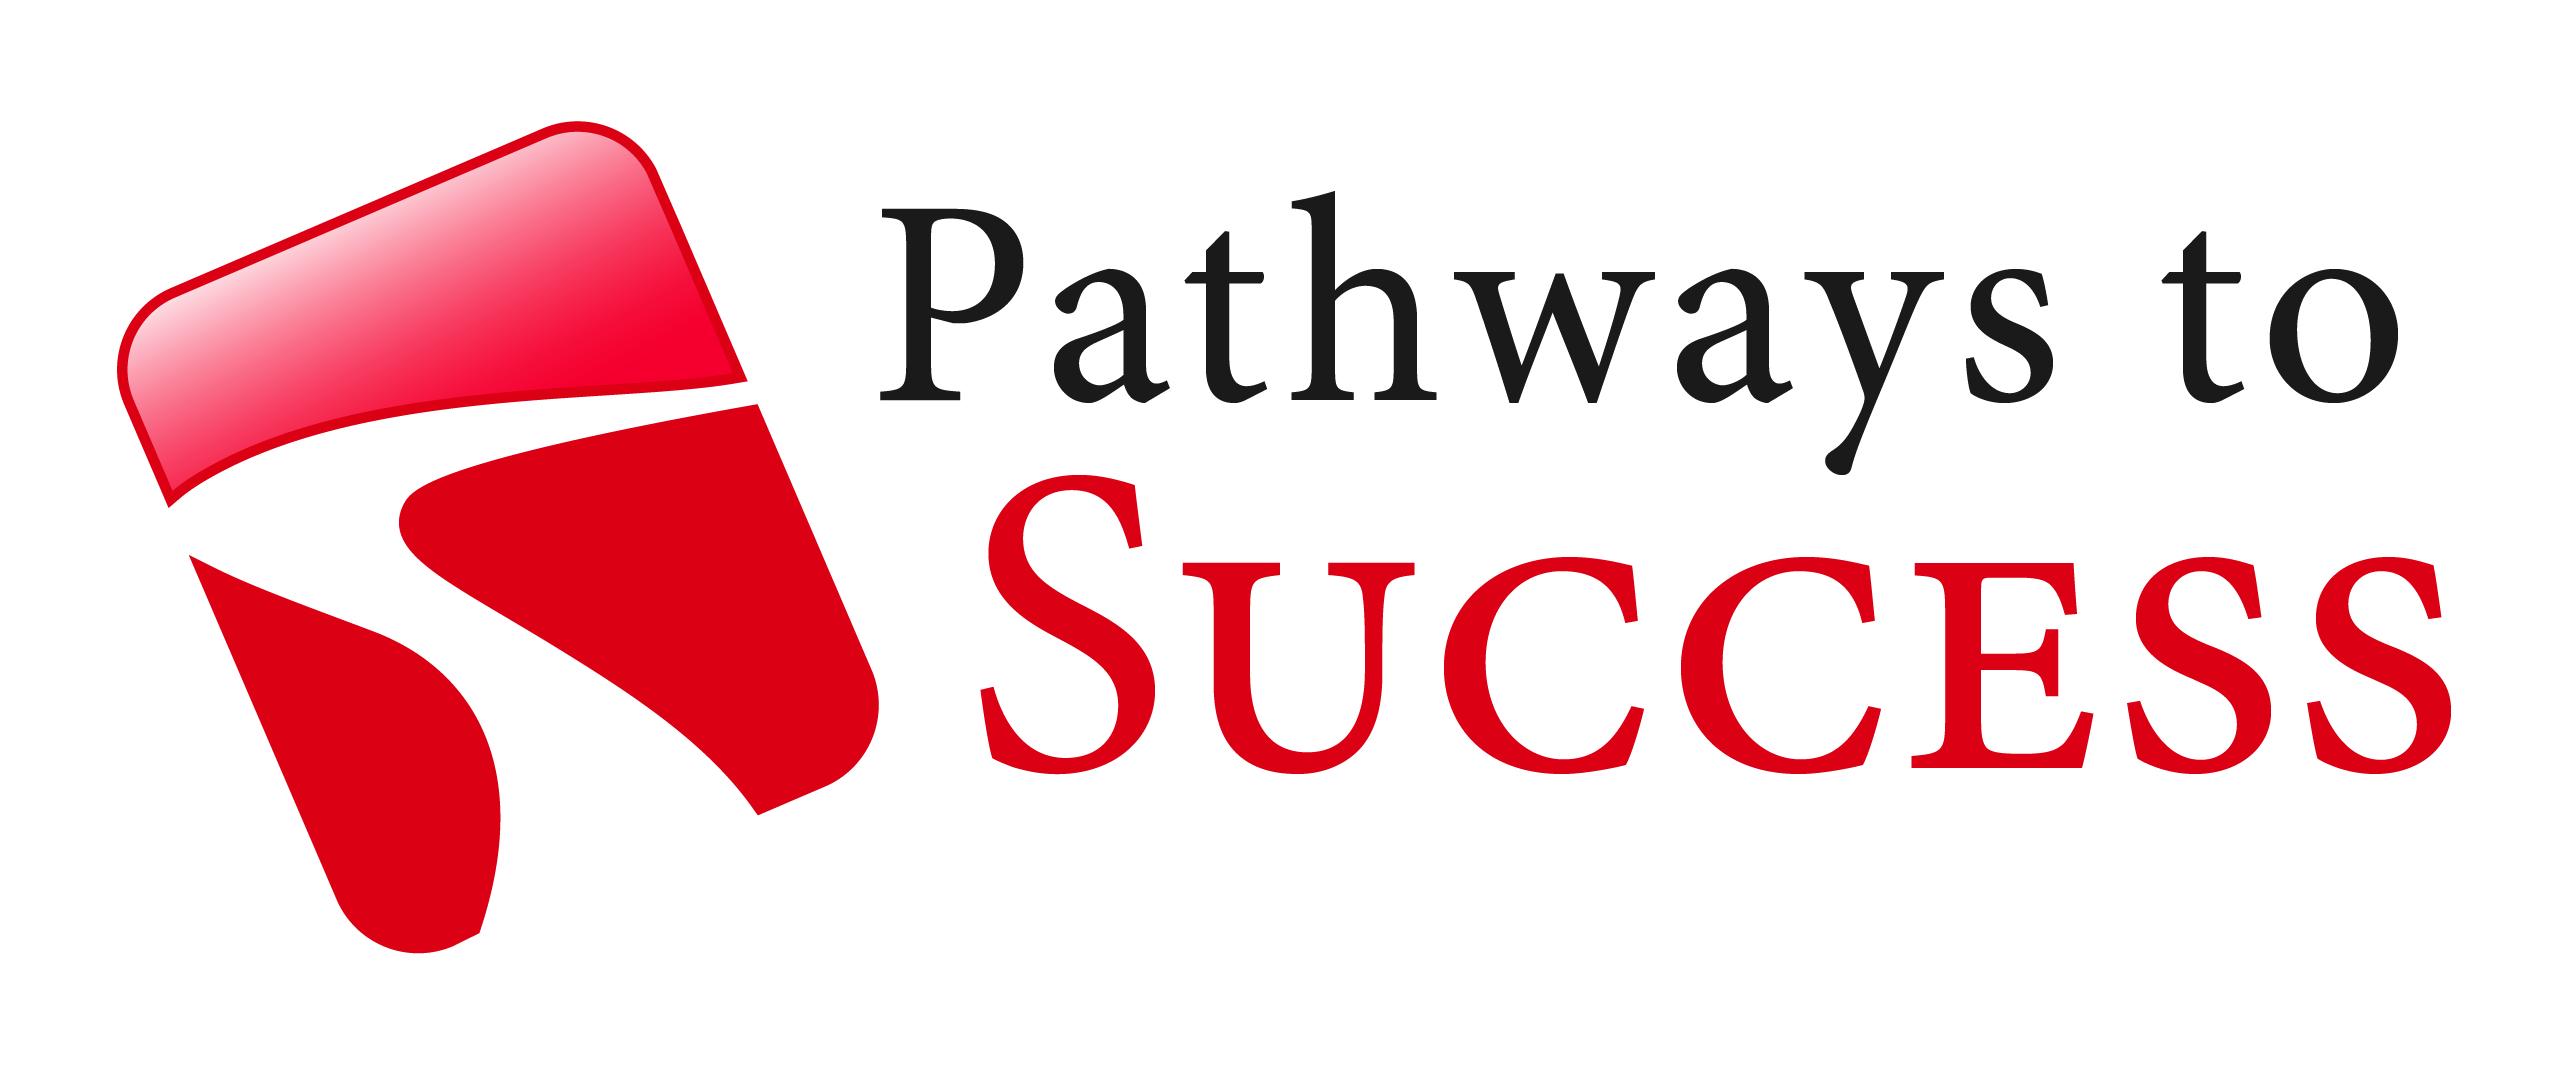 pathway to success เลือกเรียนที่ ignite ได้มากกว่าแค่ 'เรียน'  we build the best version of you  ดี.